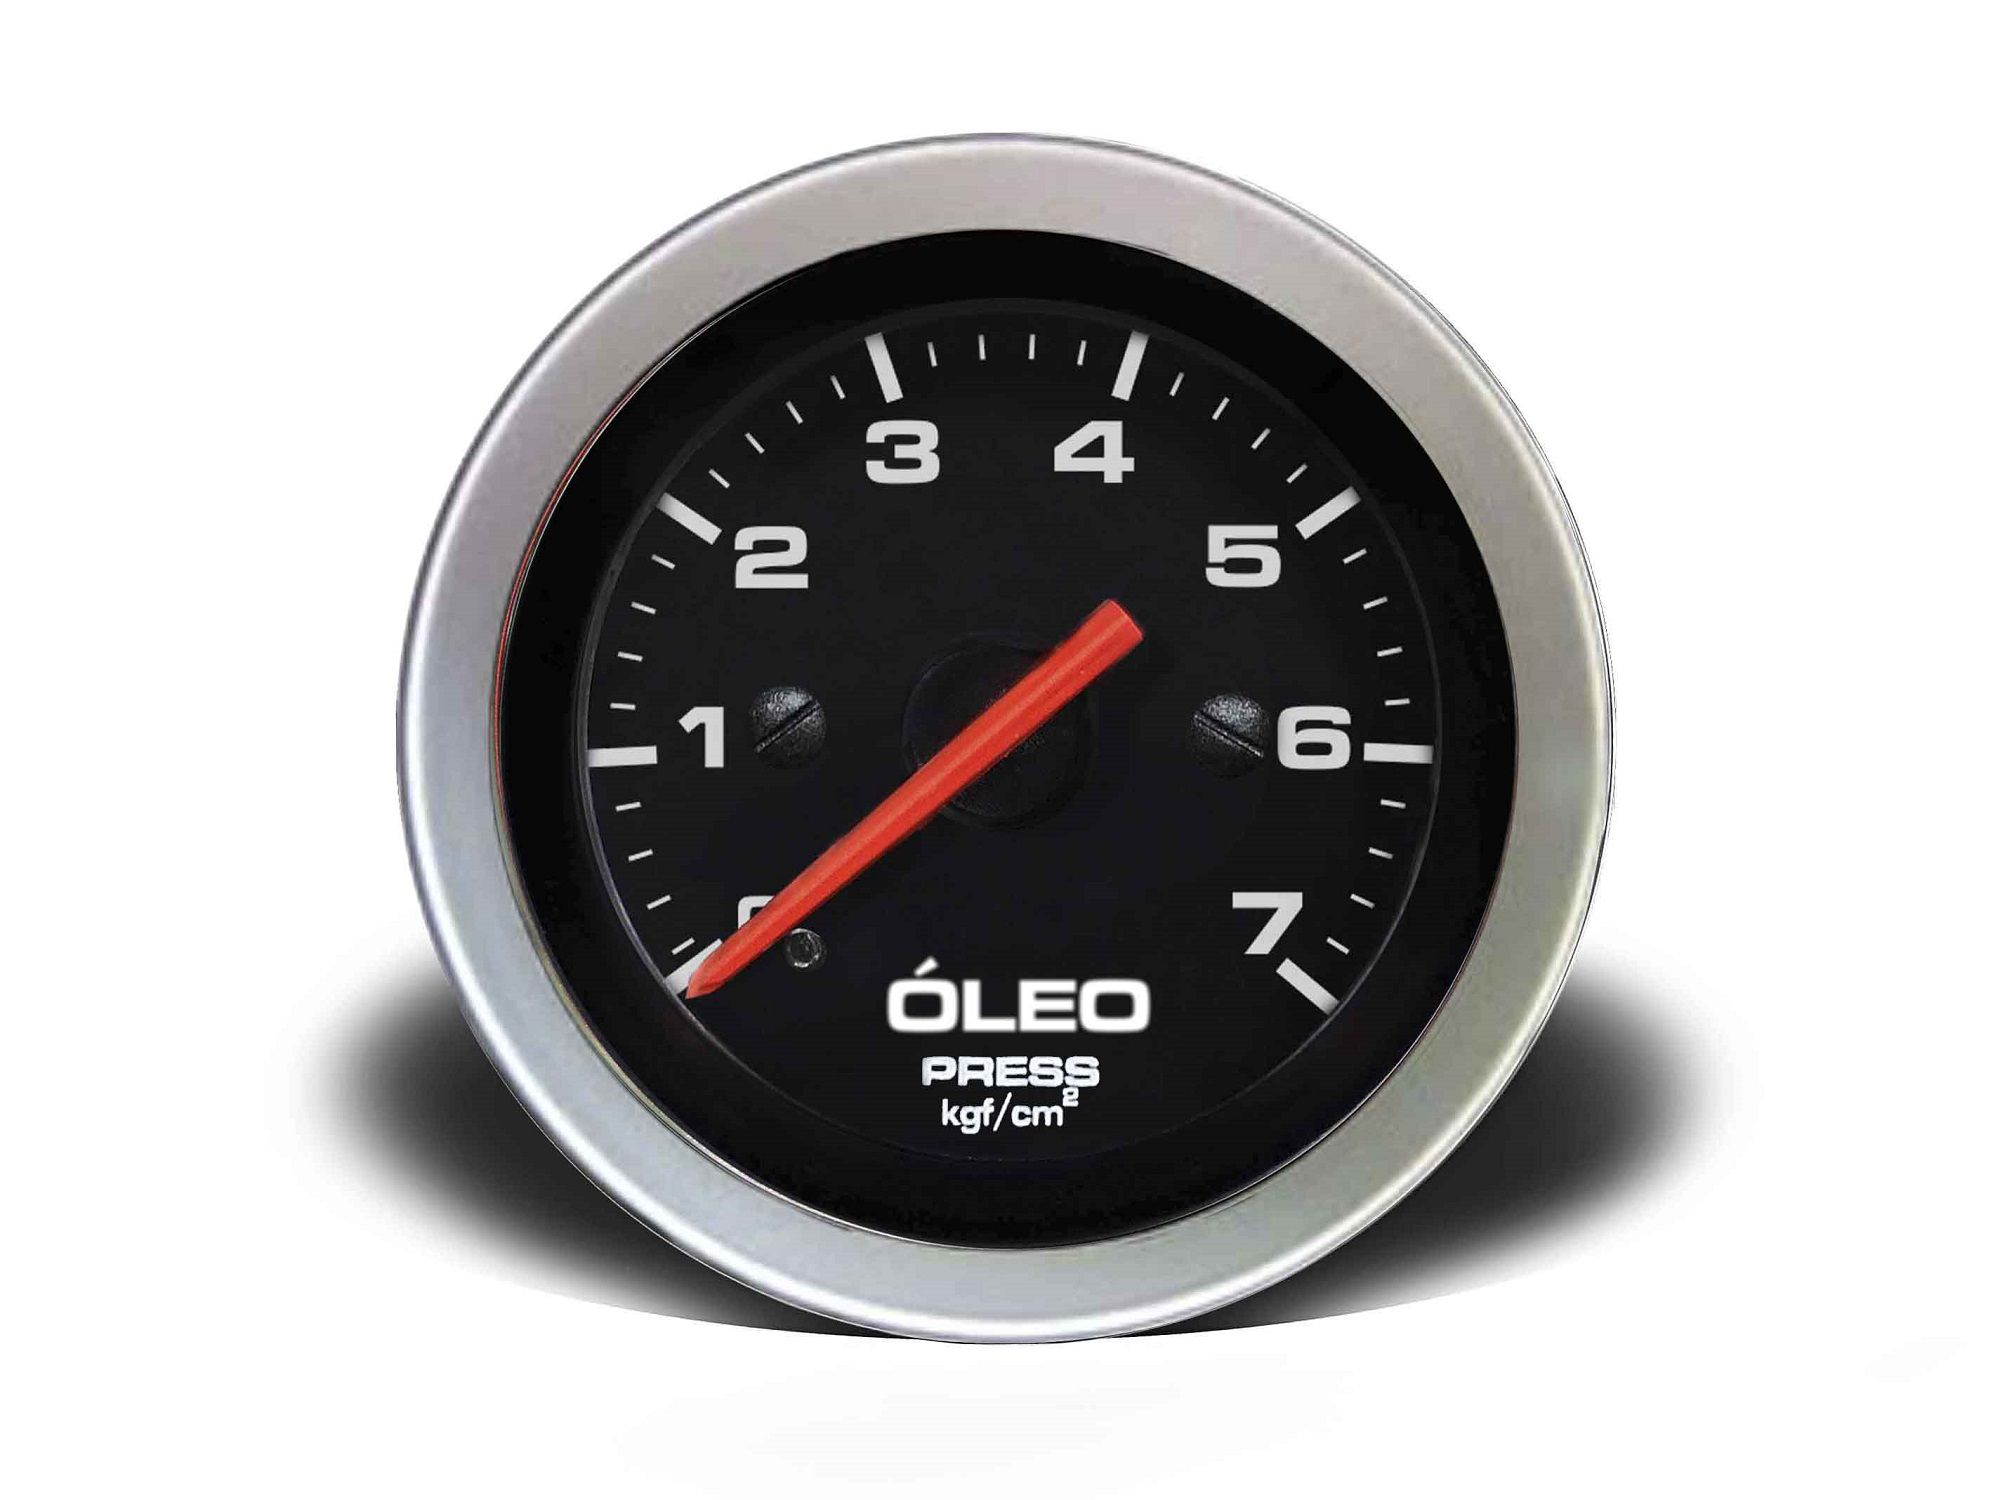 Relogio Pressao de Oleo 7kg Sport 52mm Cronomac